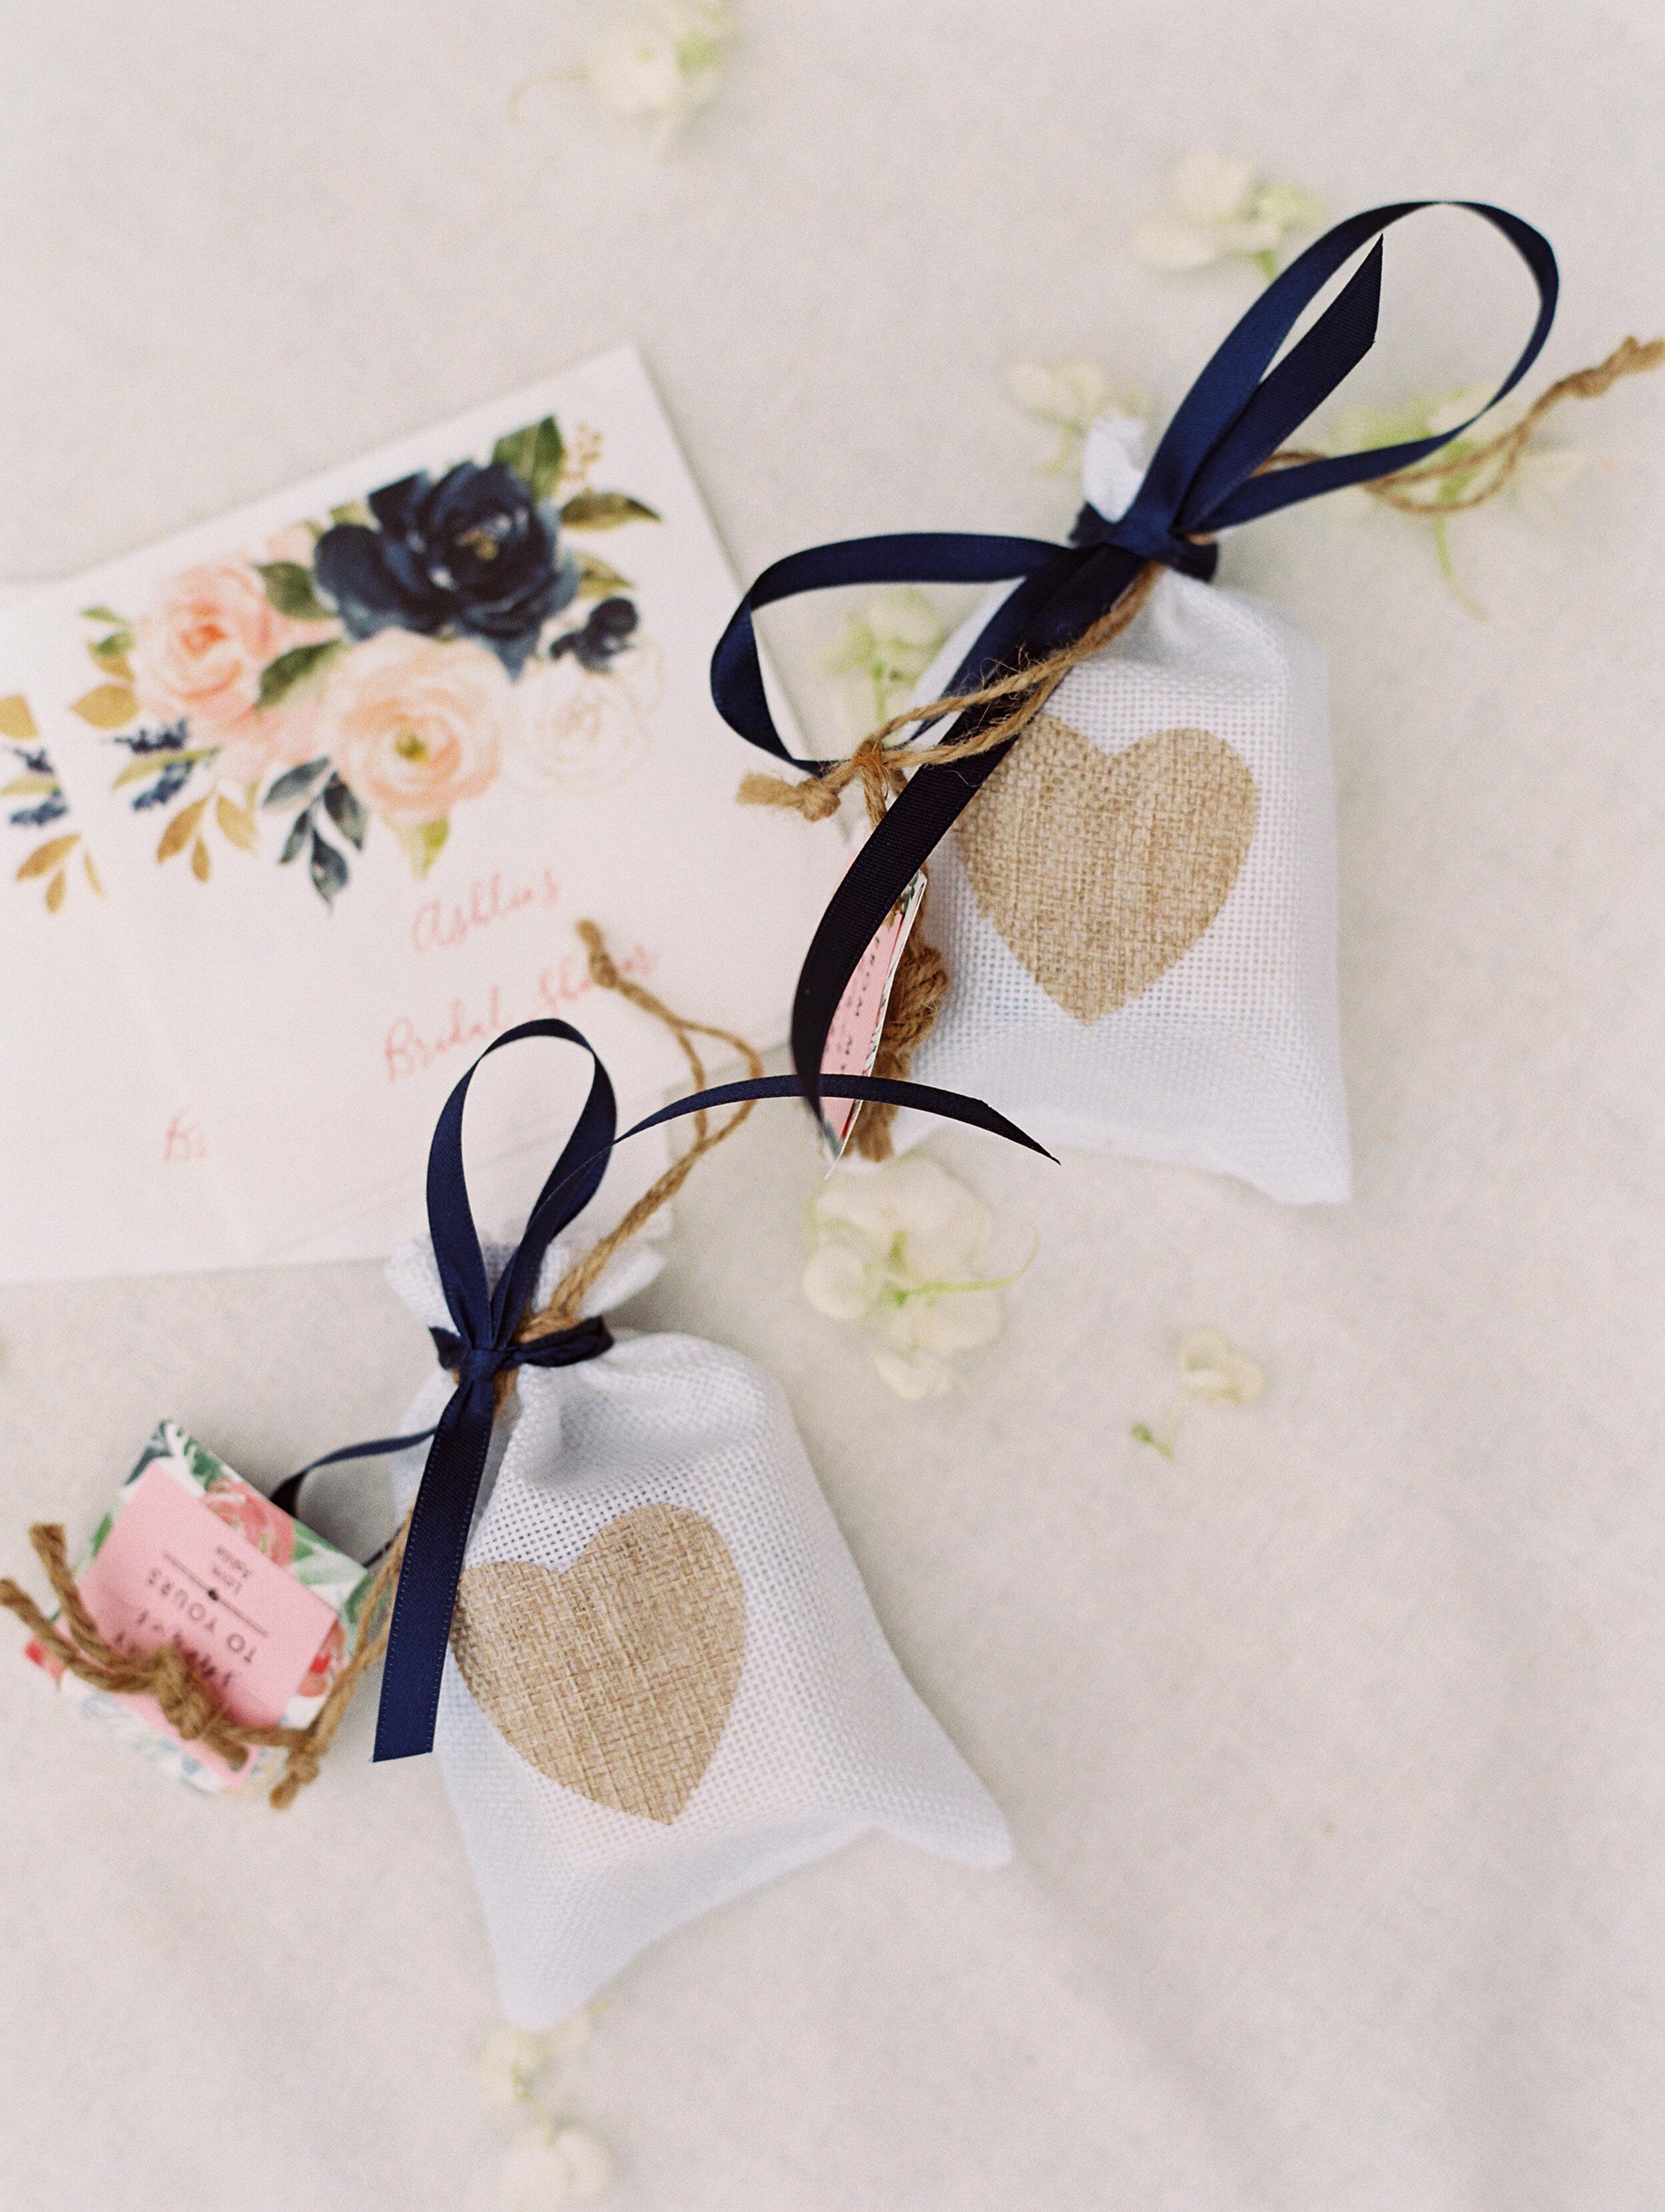 Kuiper+Wedding+Details-62.jpg